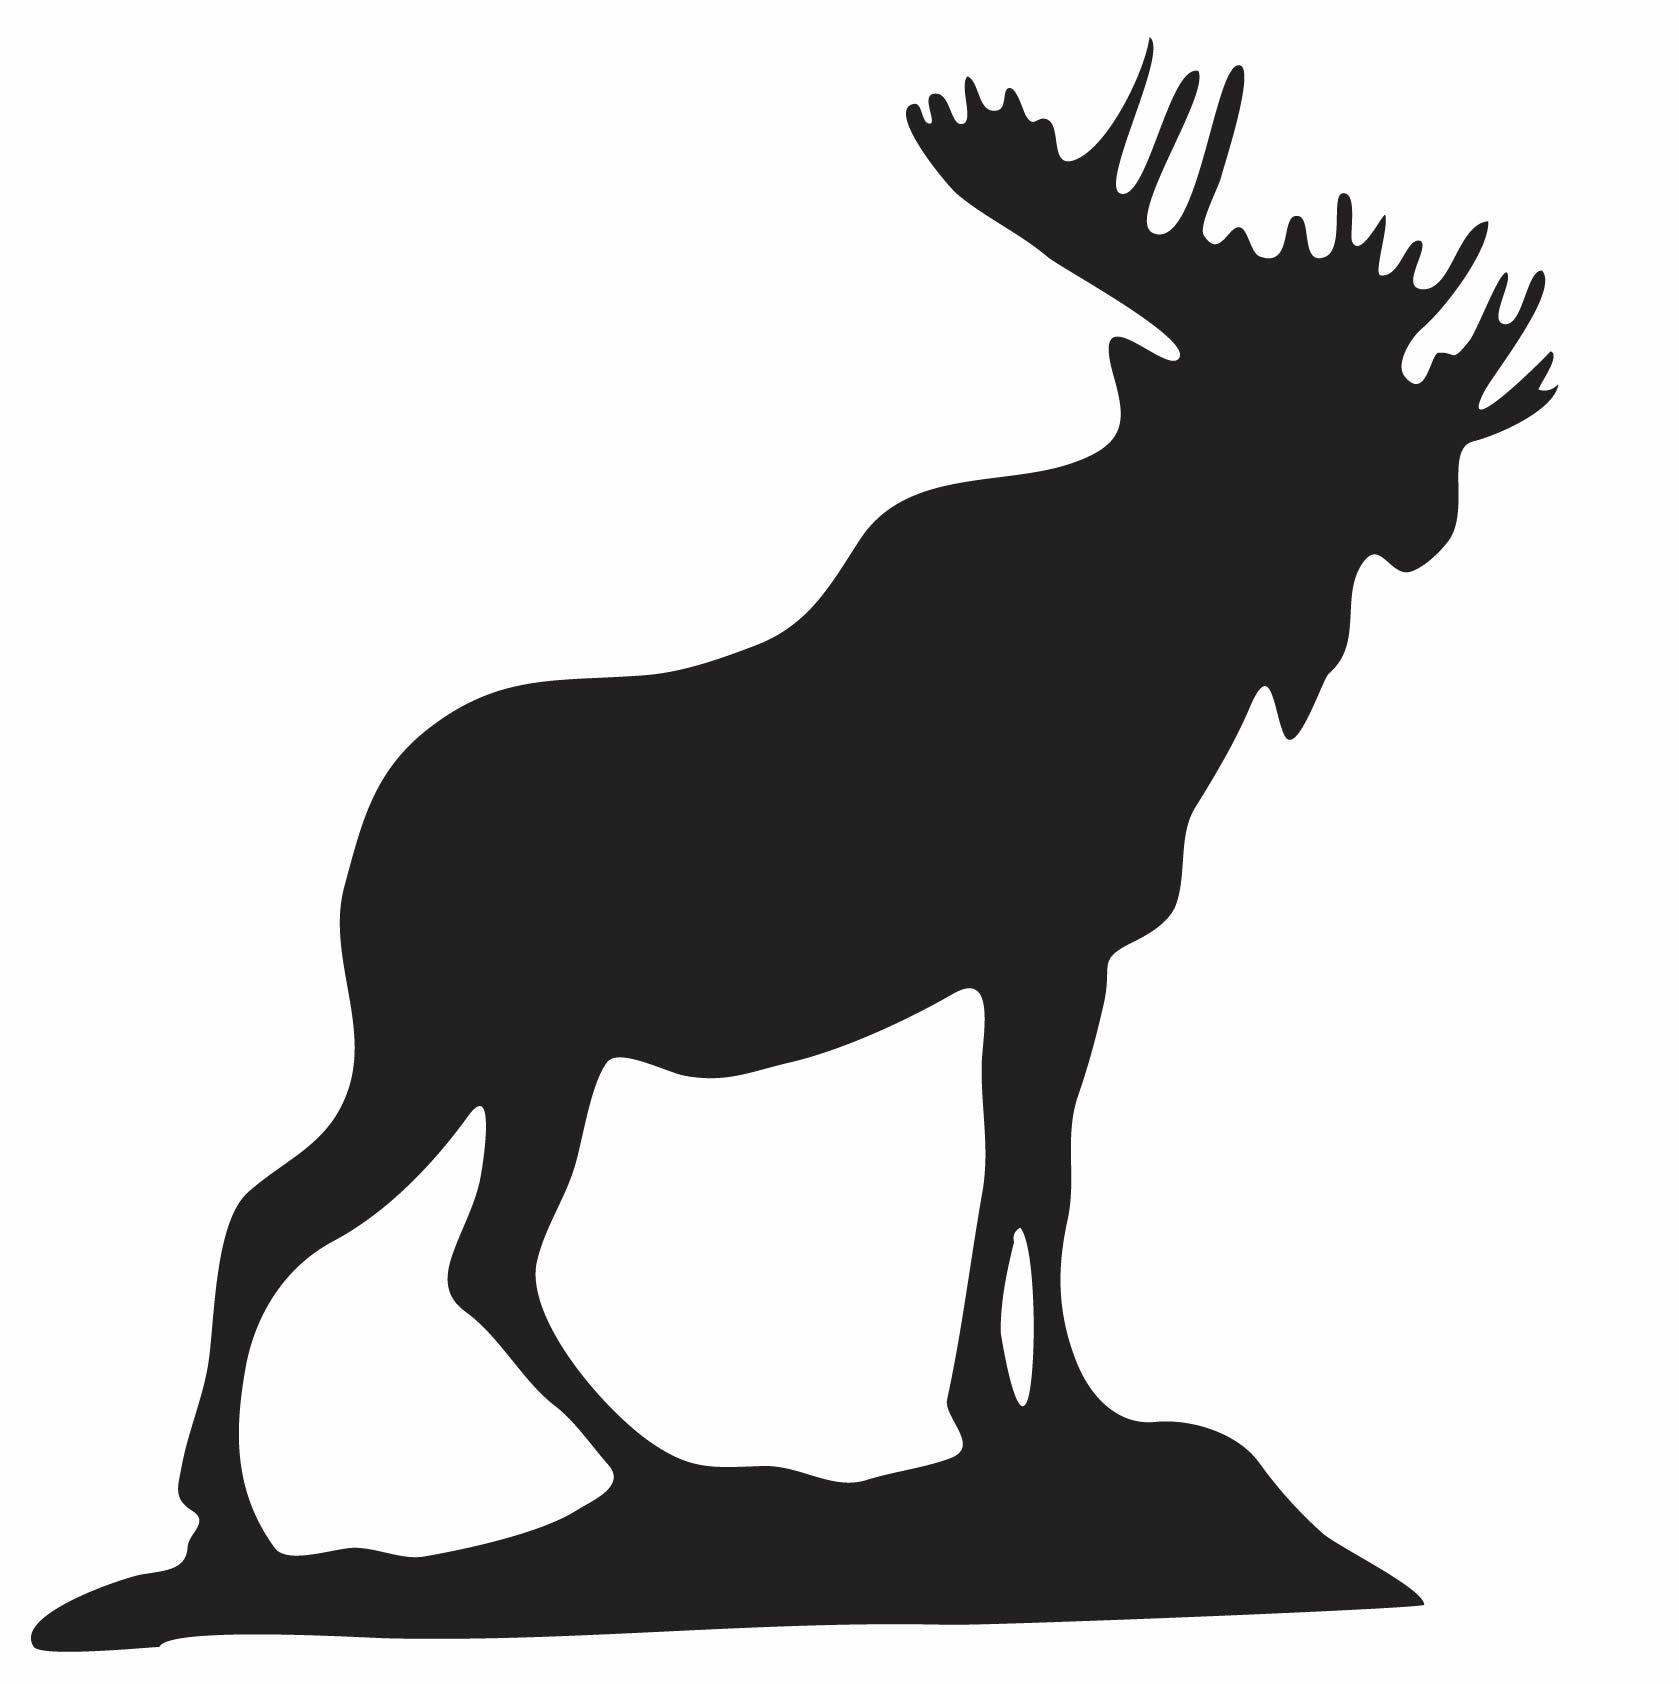 Moose clipart female moose. Photos graphics international